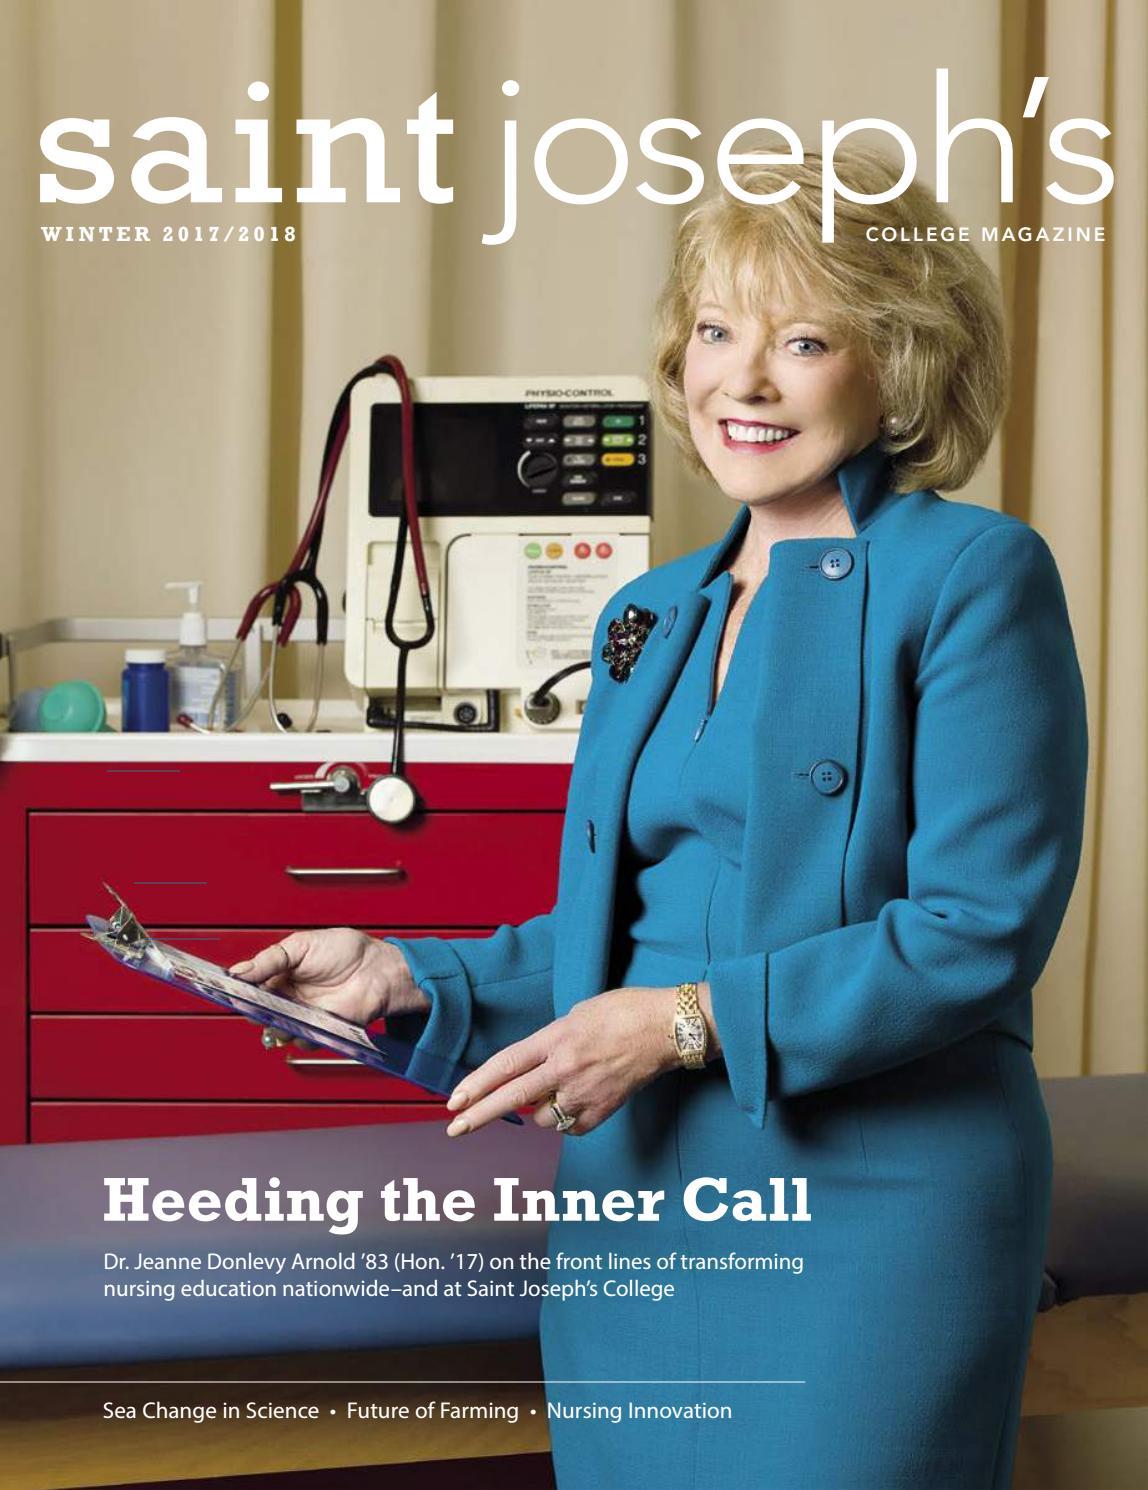 Saint Joseph's College Magazine Winter 2017-18 by Saint Joseph's